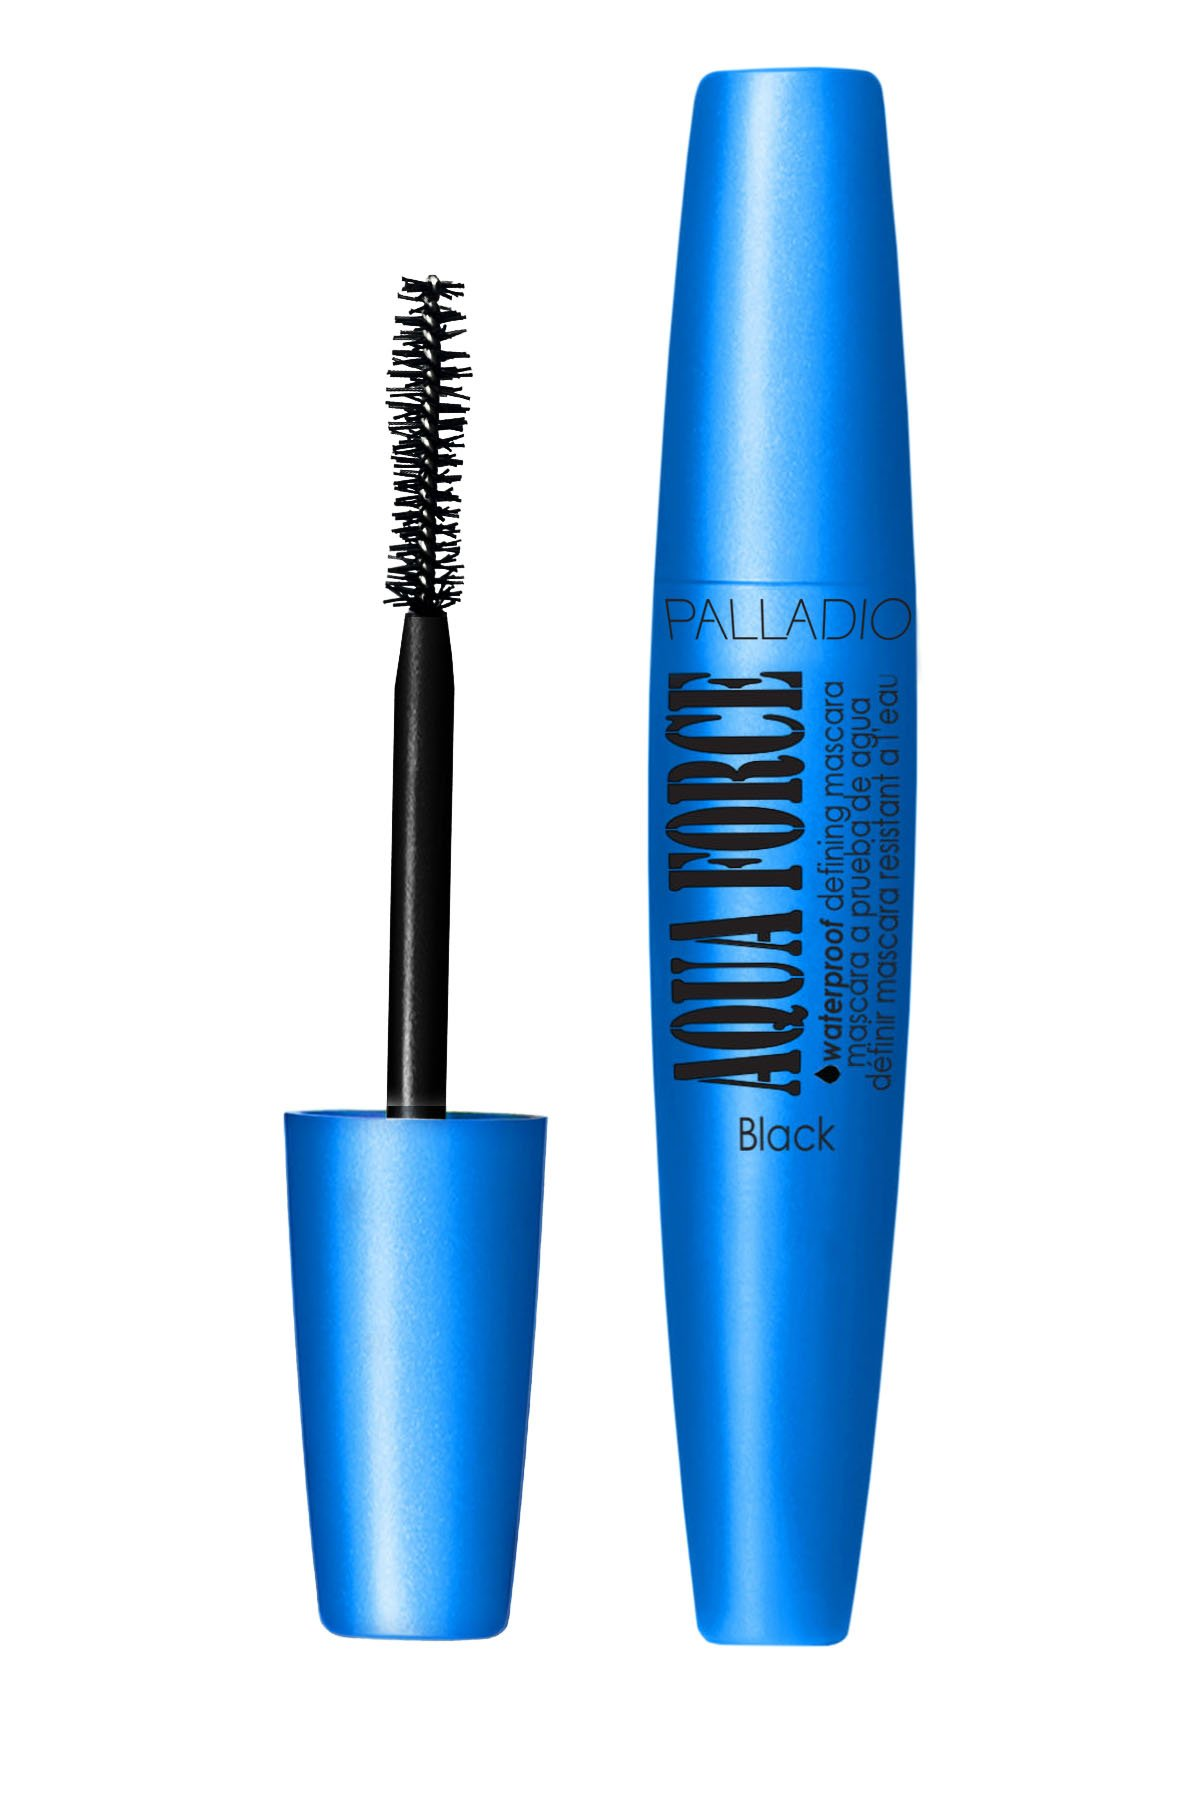 Palladio - Palladio Aqua Force Waterproof Defining Mascara, Black